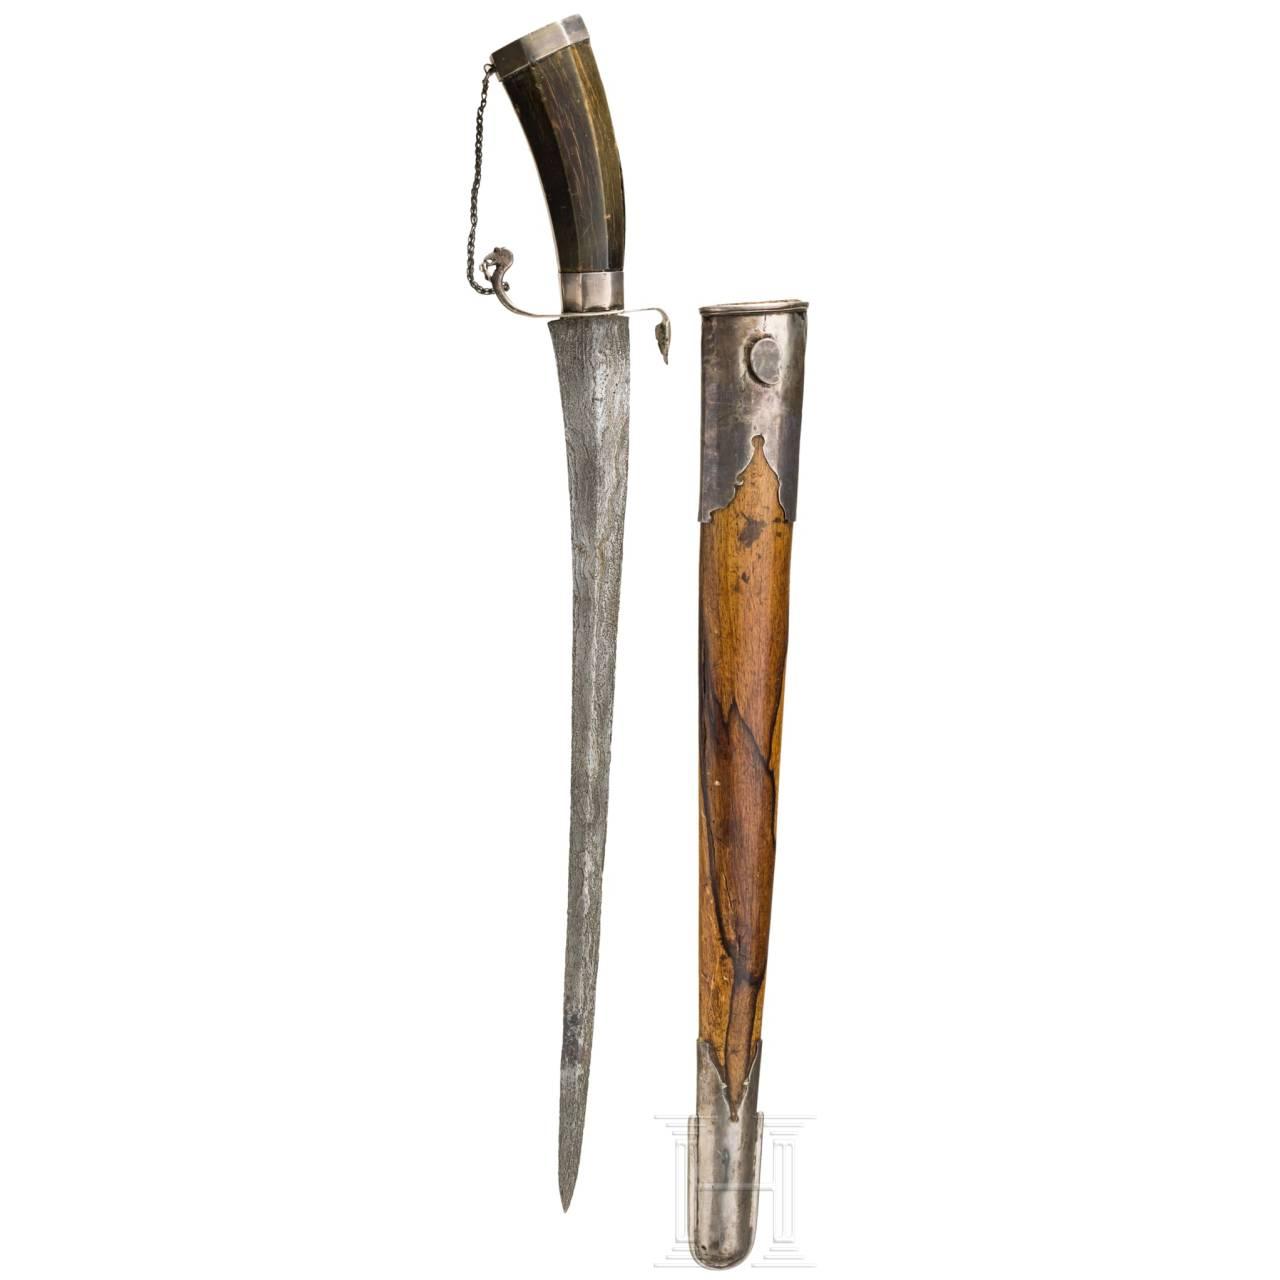 Silbermontiertes Pedang, Sumatra, 19. Jhdt.